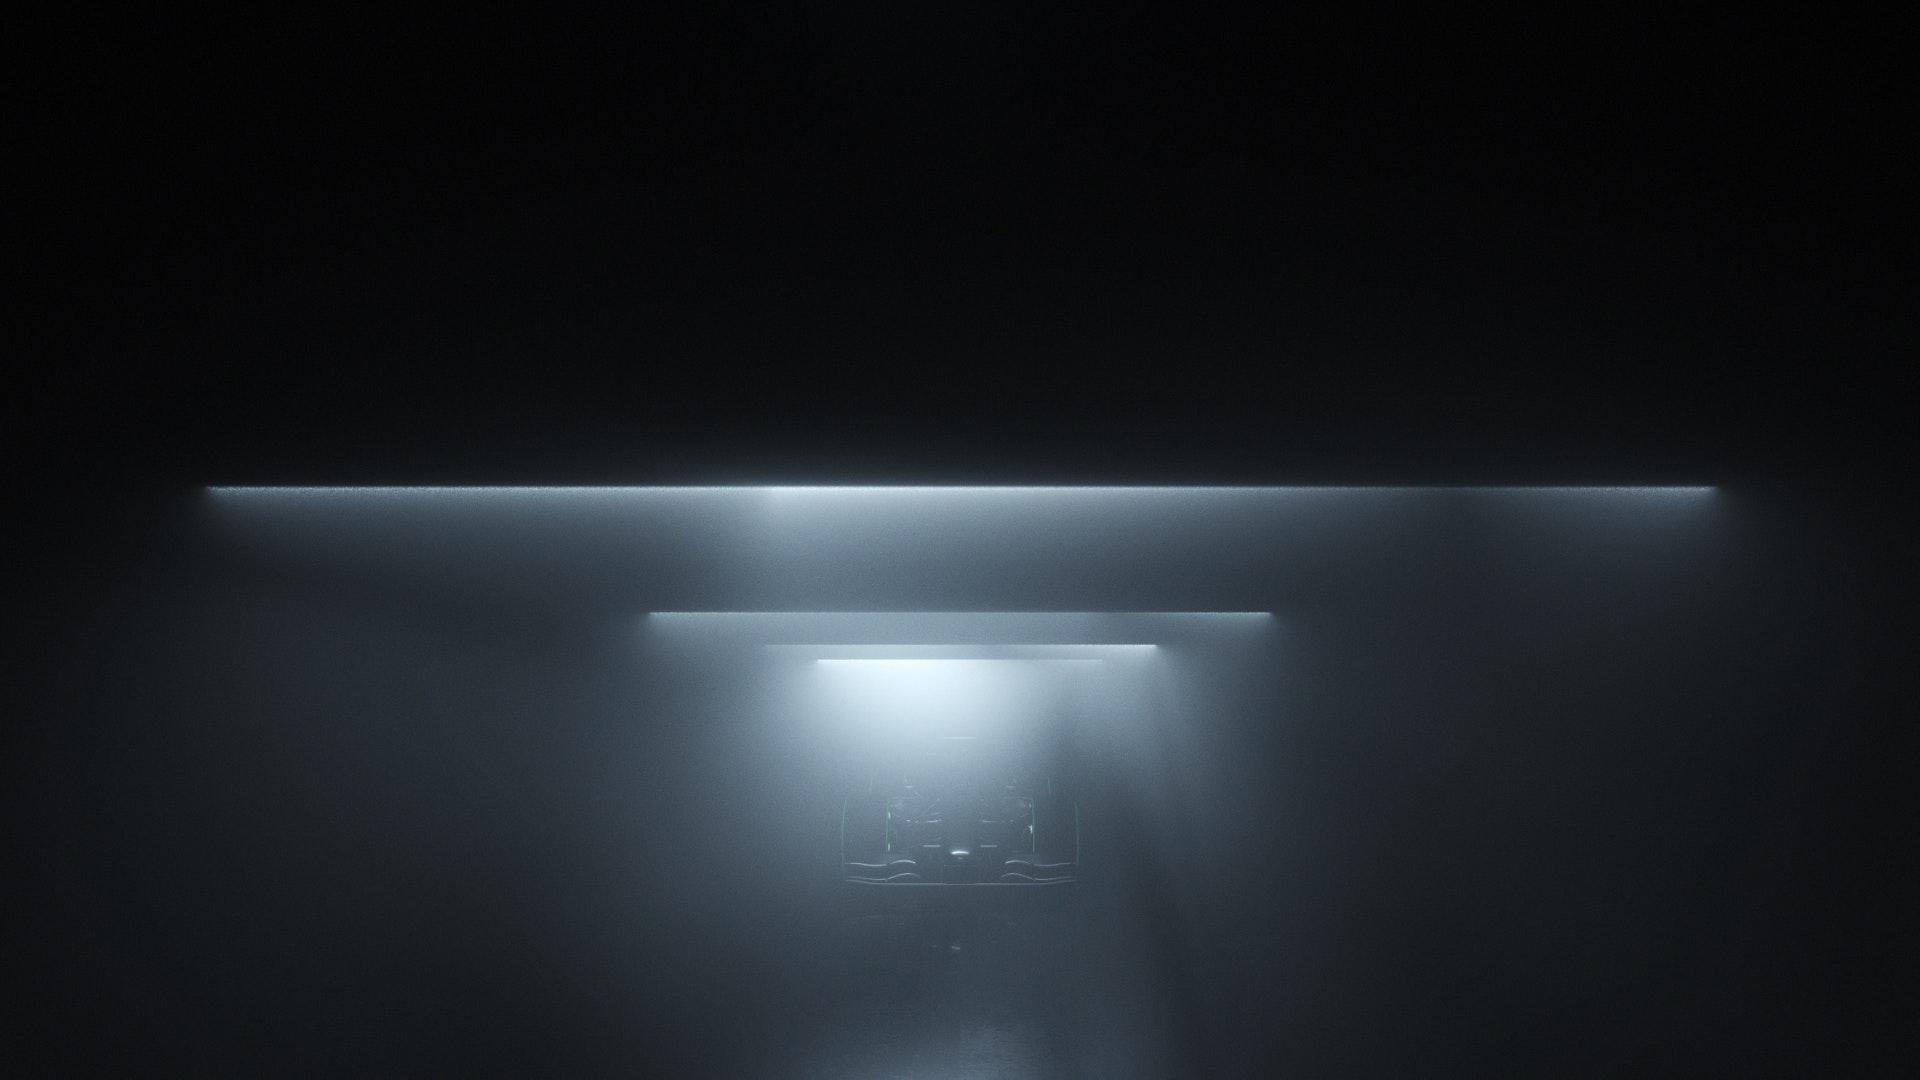 VINICIUS NALDI - Nike_Mercurial_Design_Naldi_BW_3